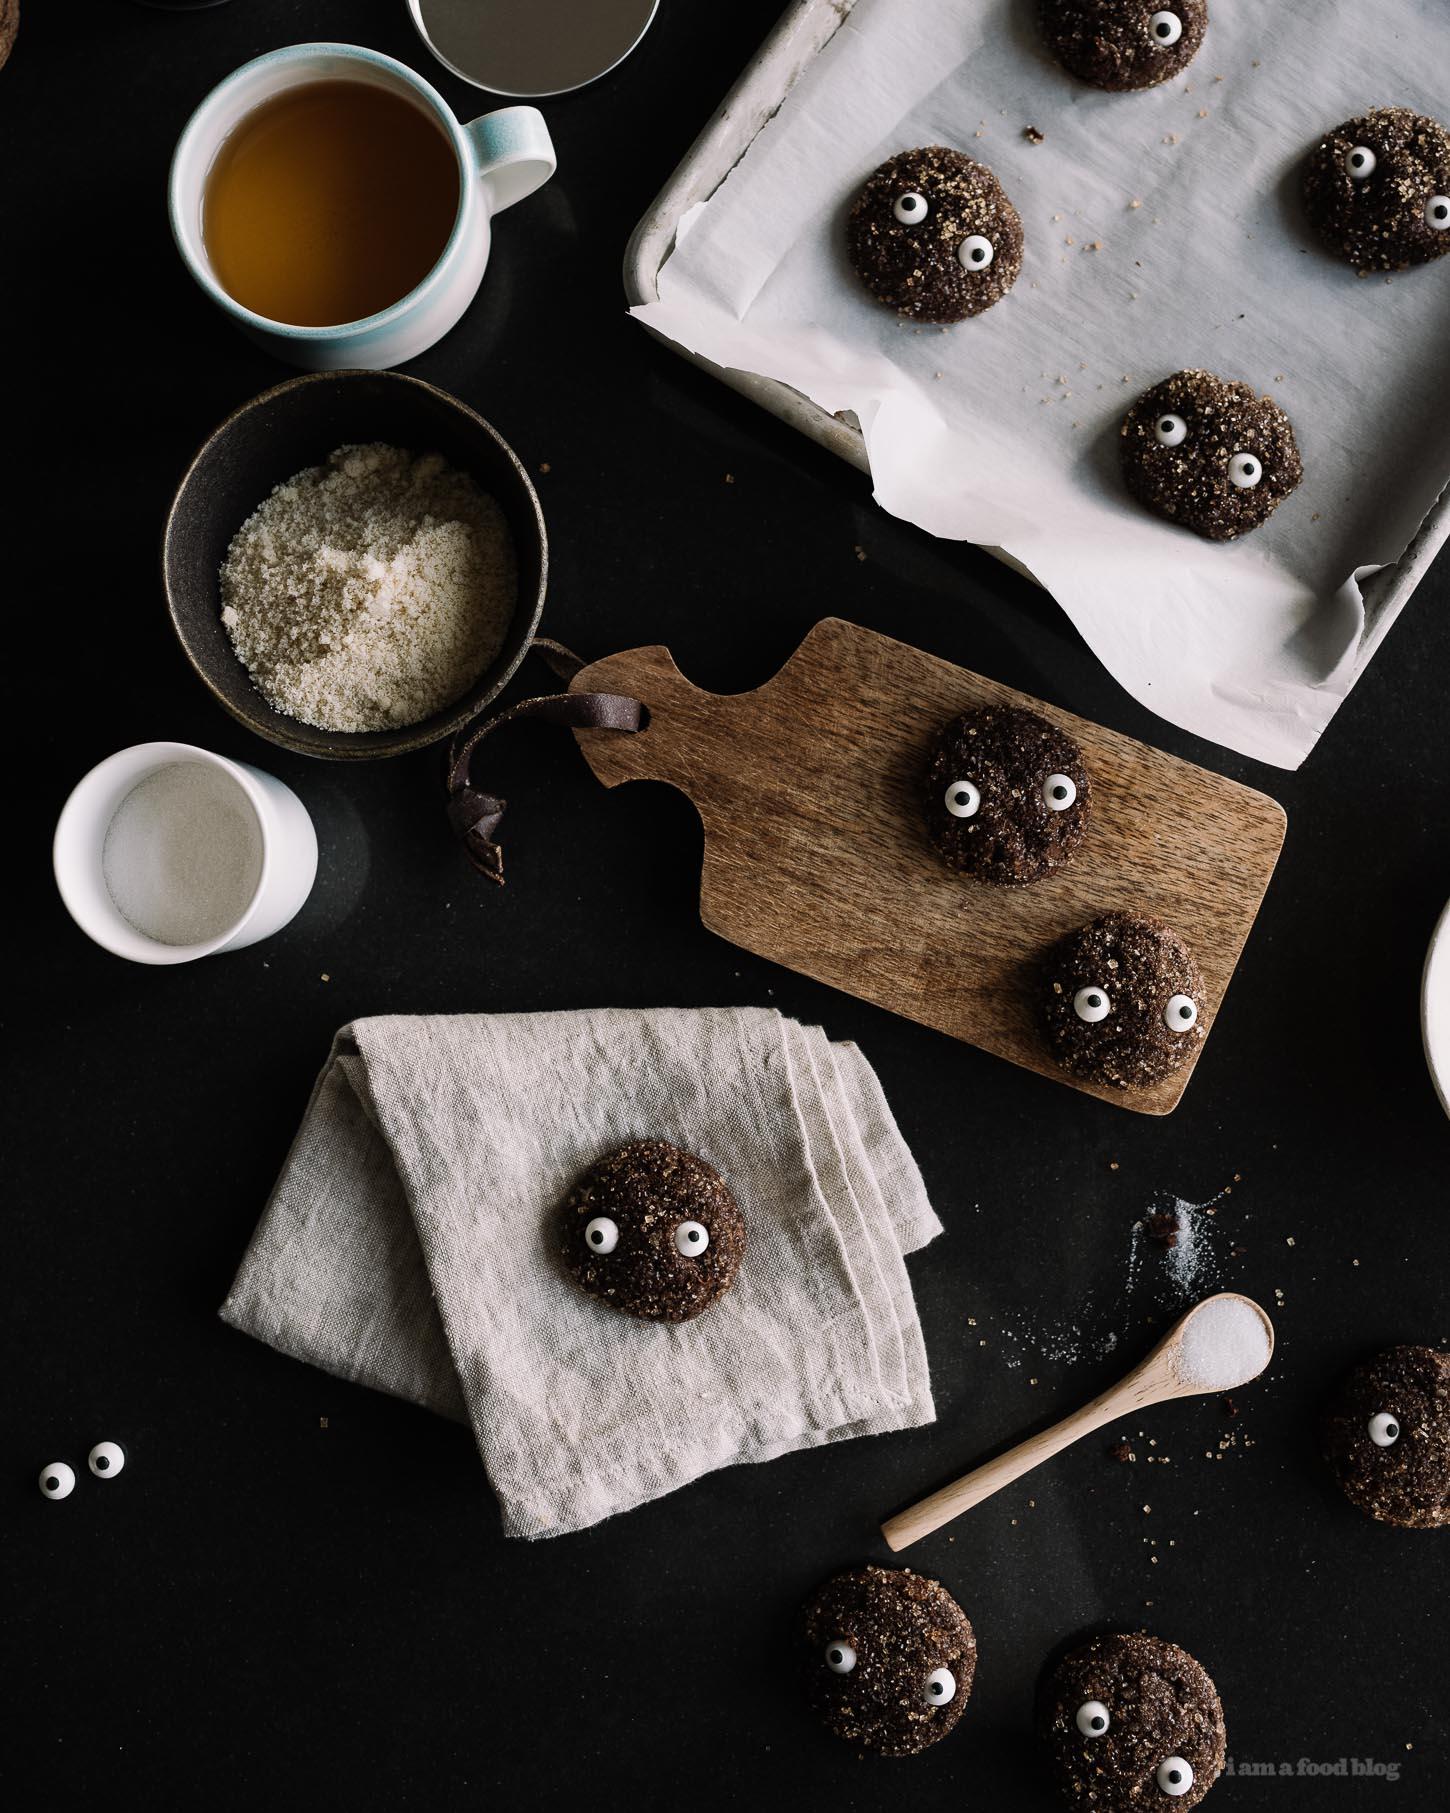 totoro soot sprite chocolate sparkle cookies - www.iamafoodblog.com